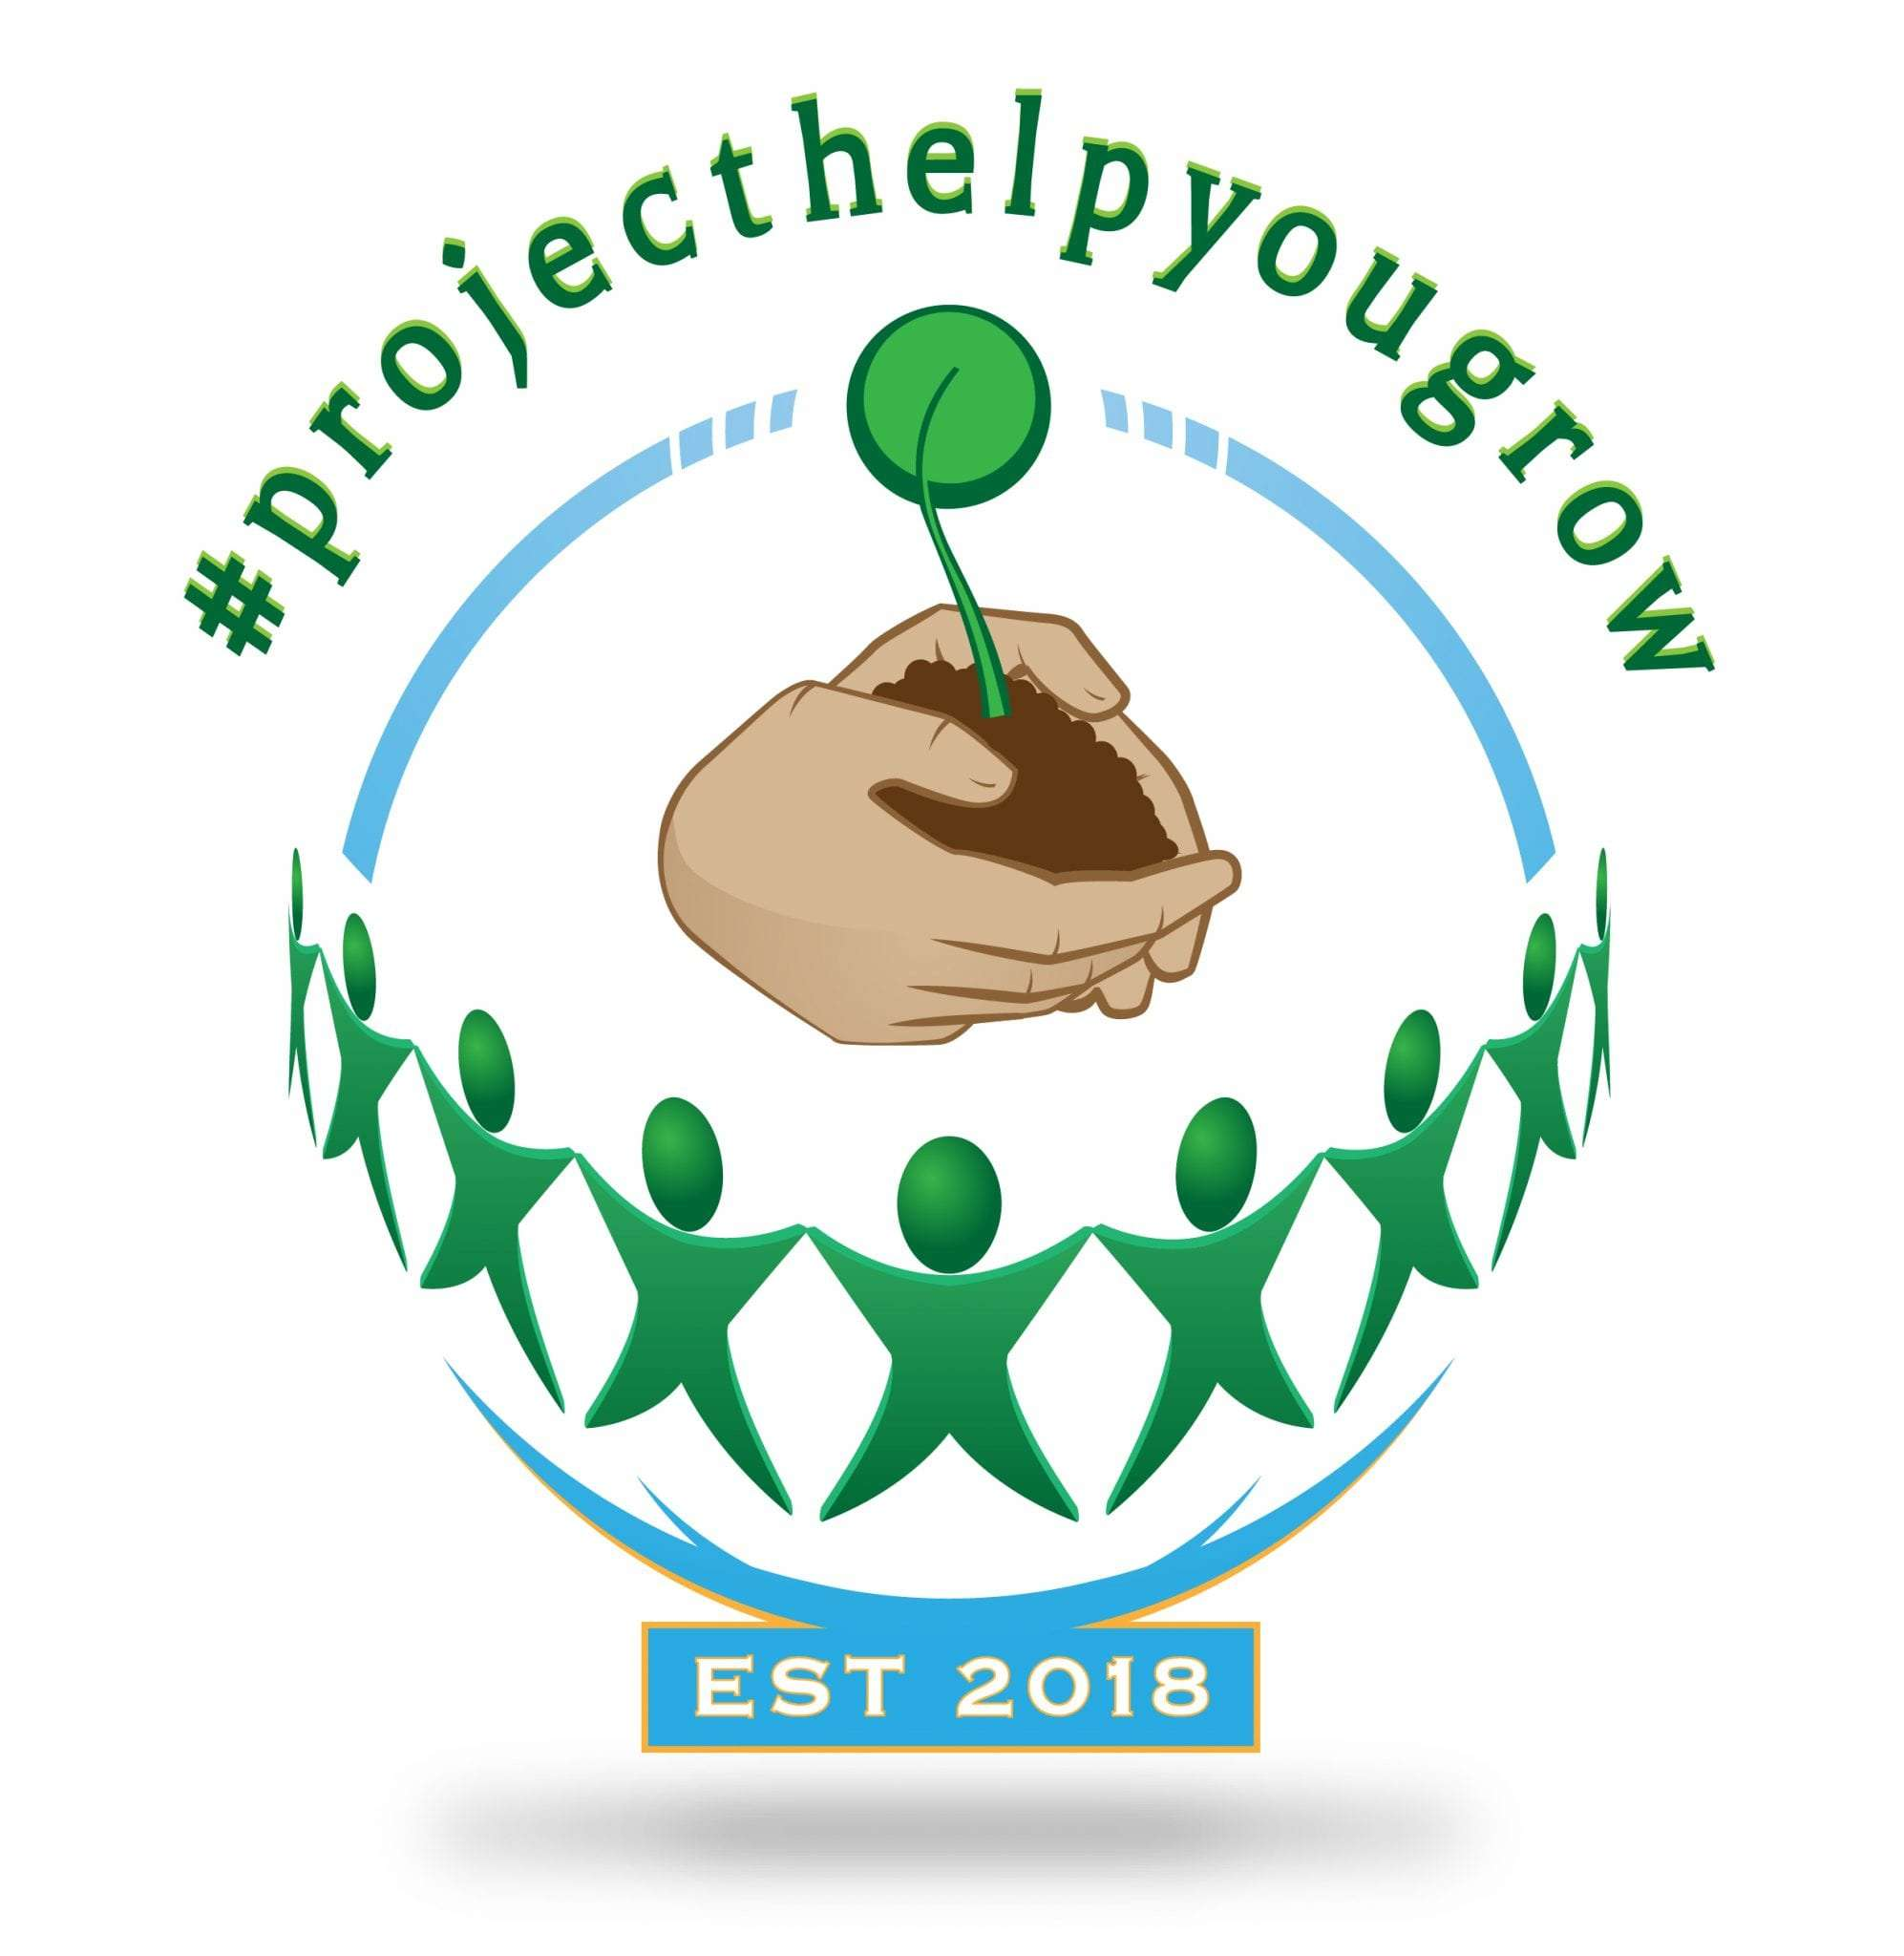 #ProjectHelpYouGrow